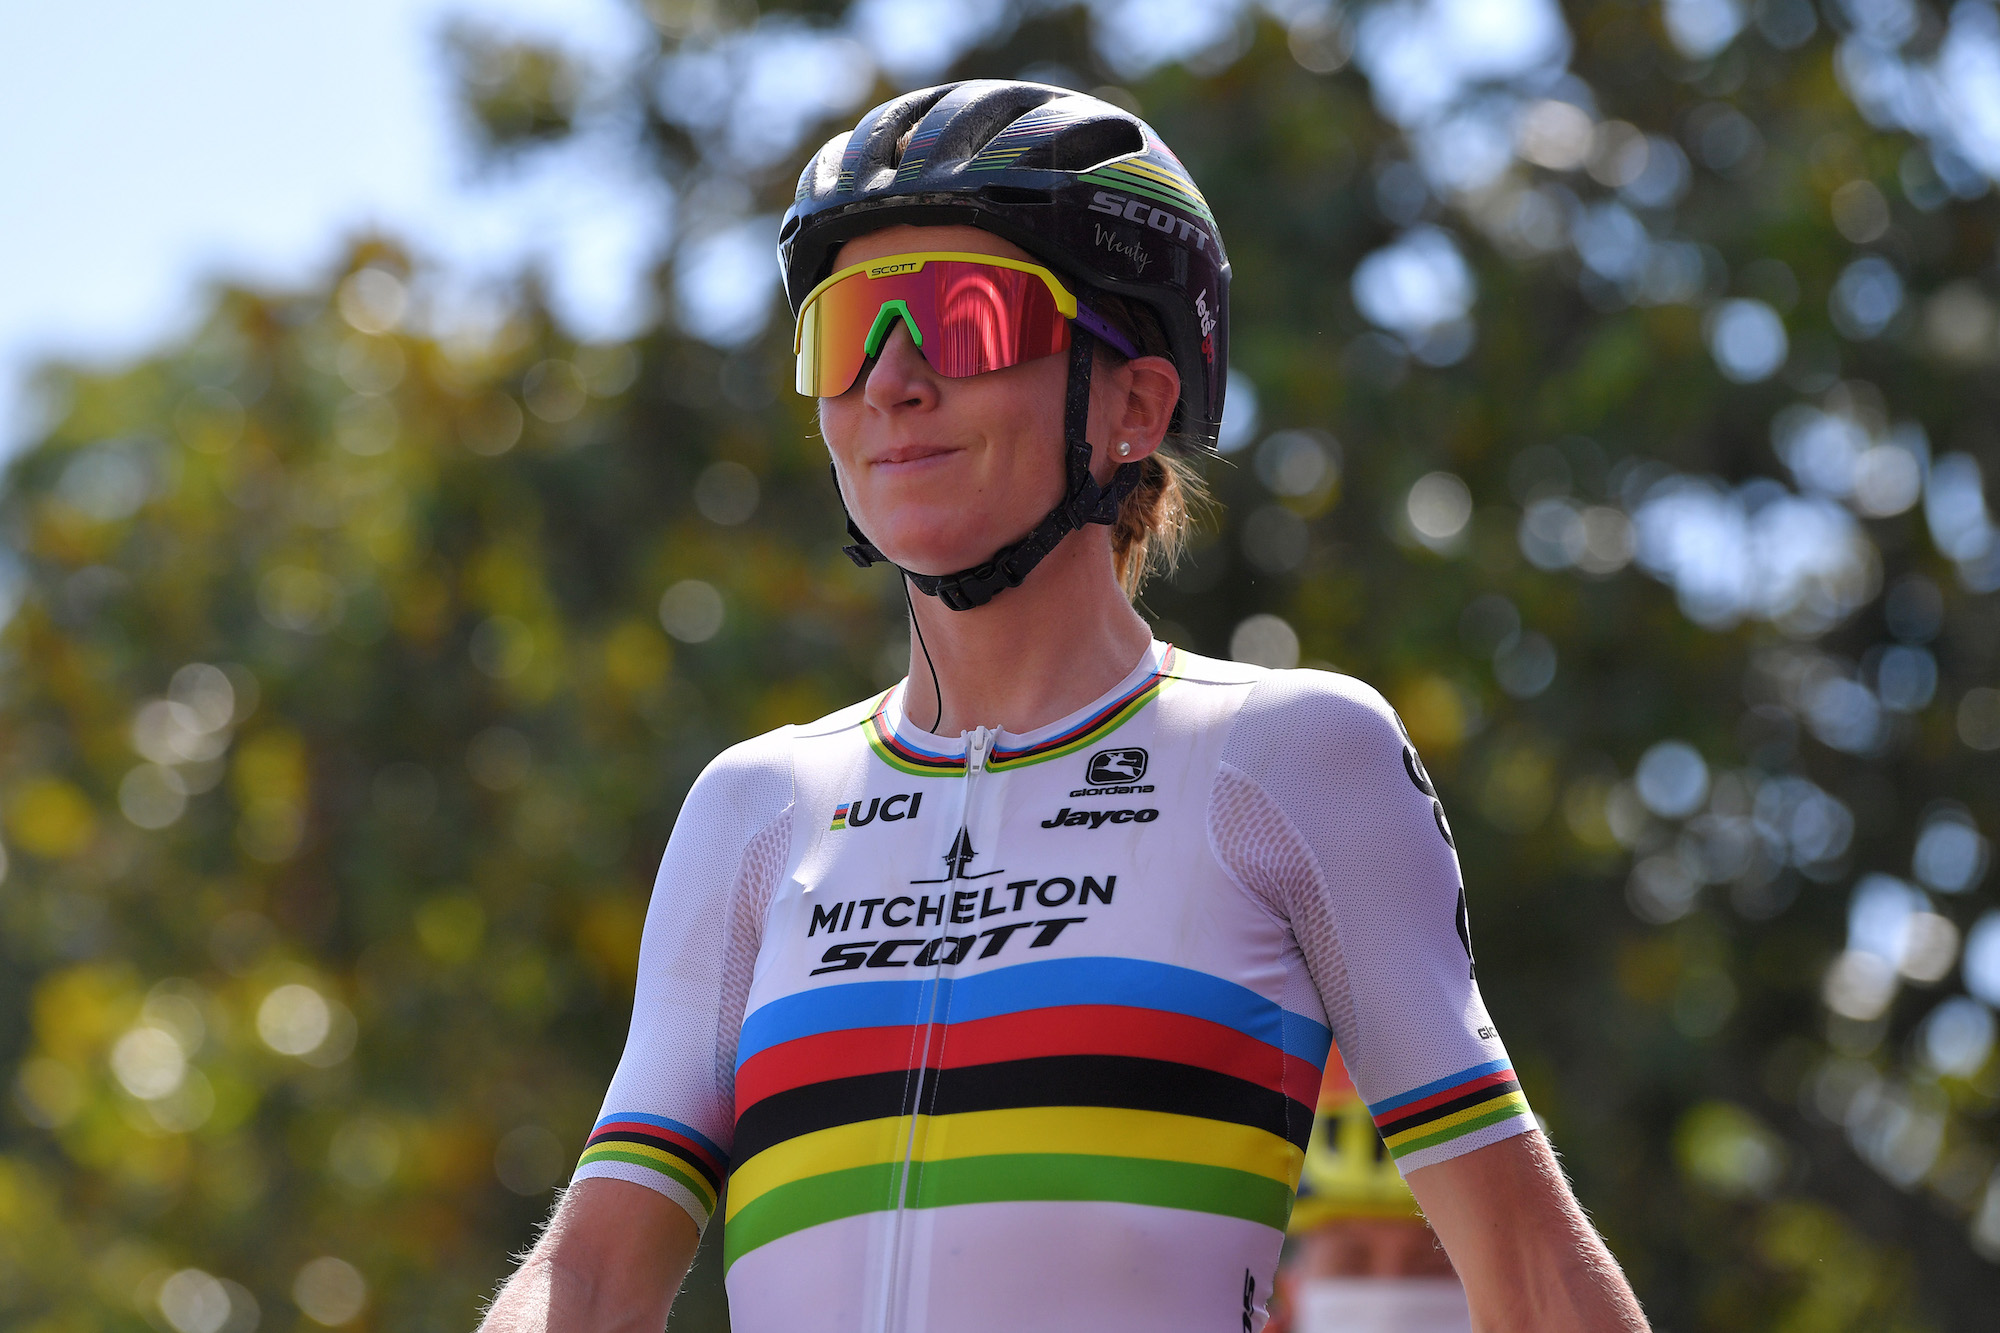 Annemiek van Vleuten close to Movistar transfer, according to reports - Cycling Weekly